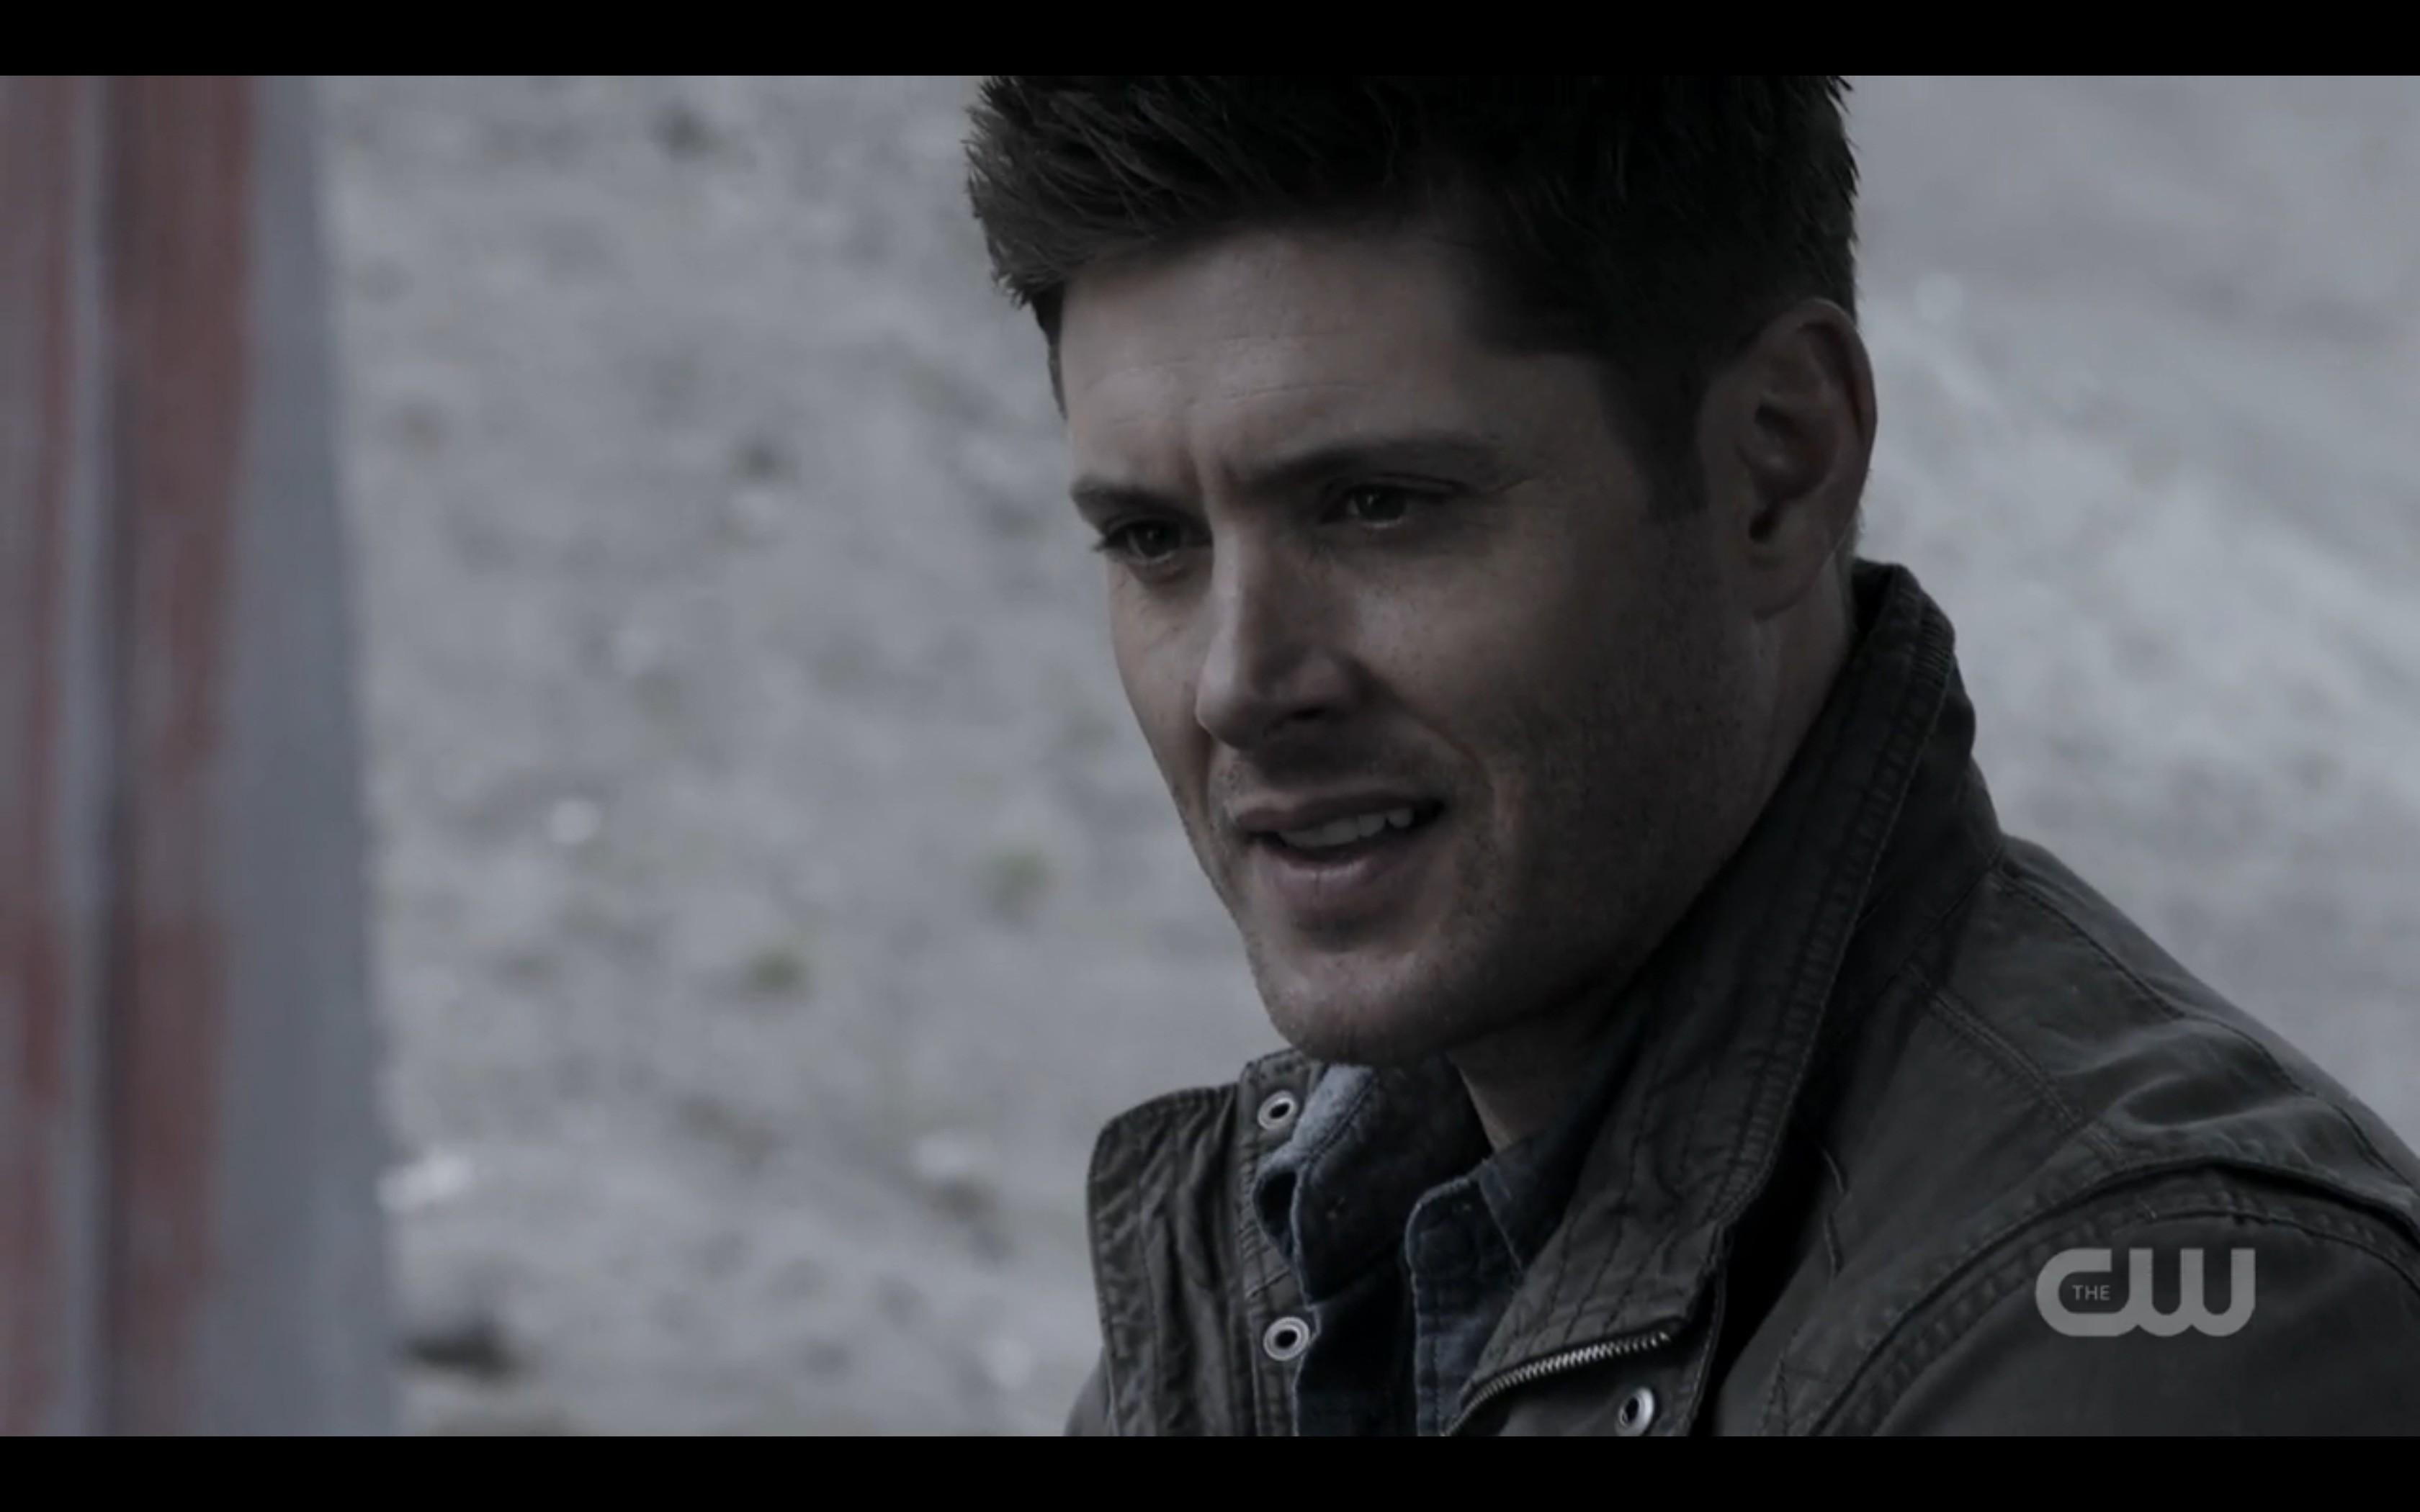 supernatural dean hugging sam winchester finale watchtower